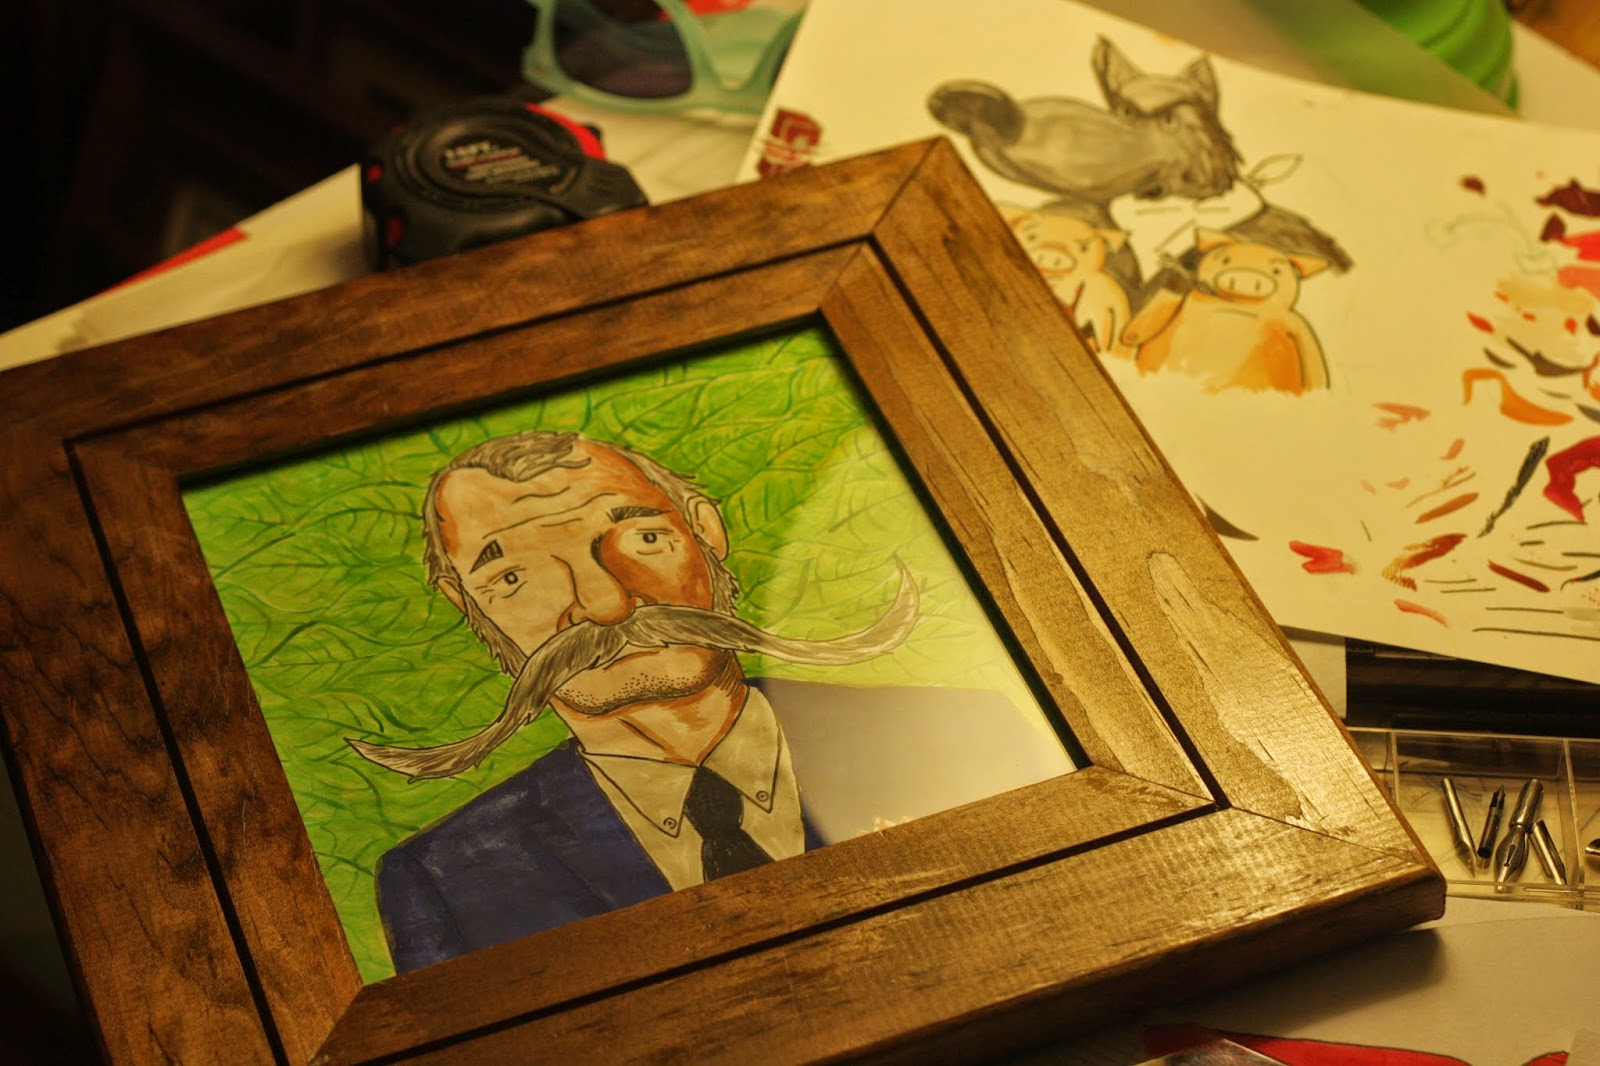 Bill Murray Illustration - Ben J Hutchison